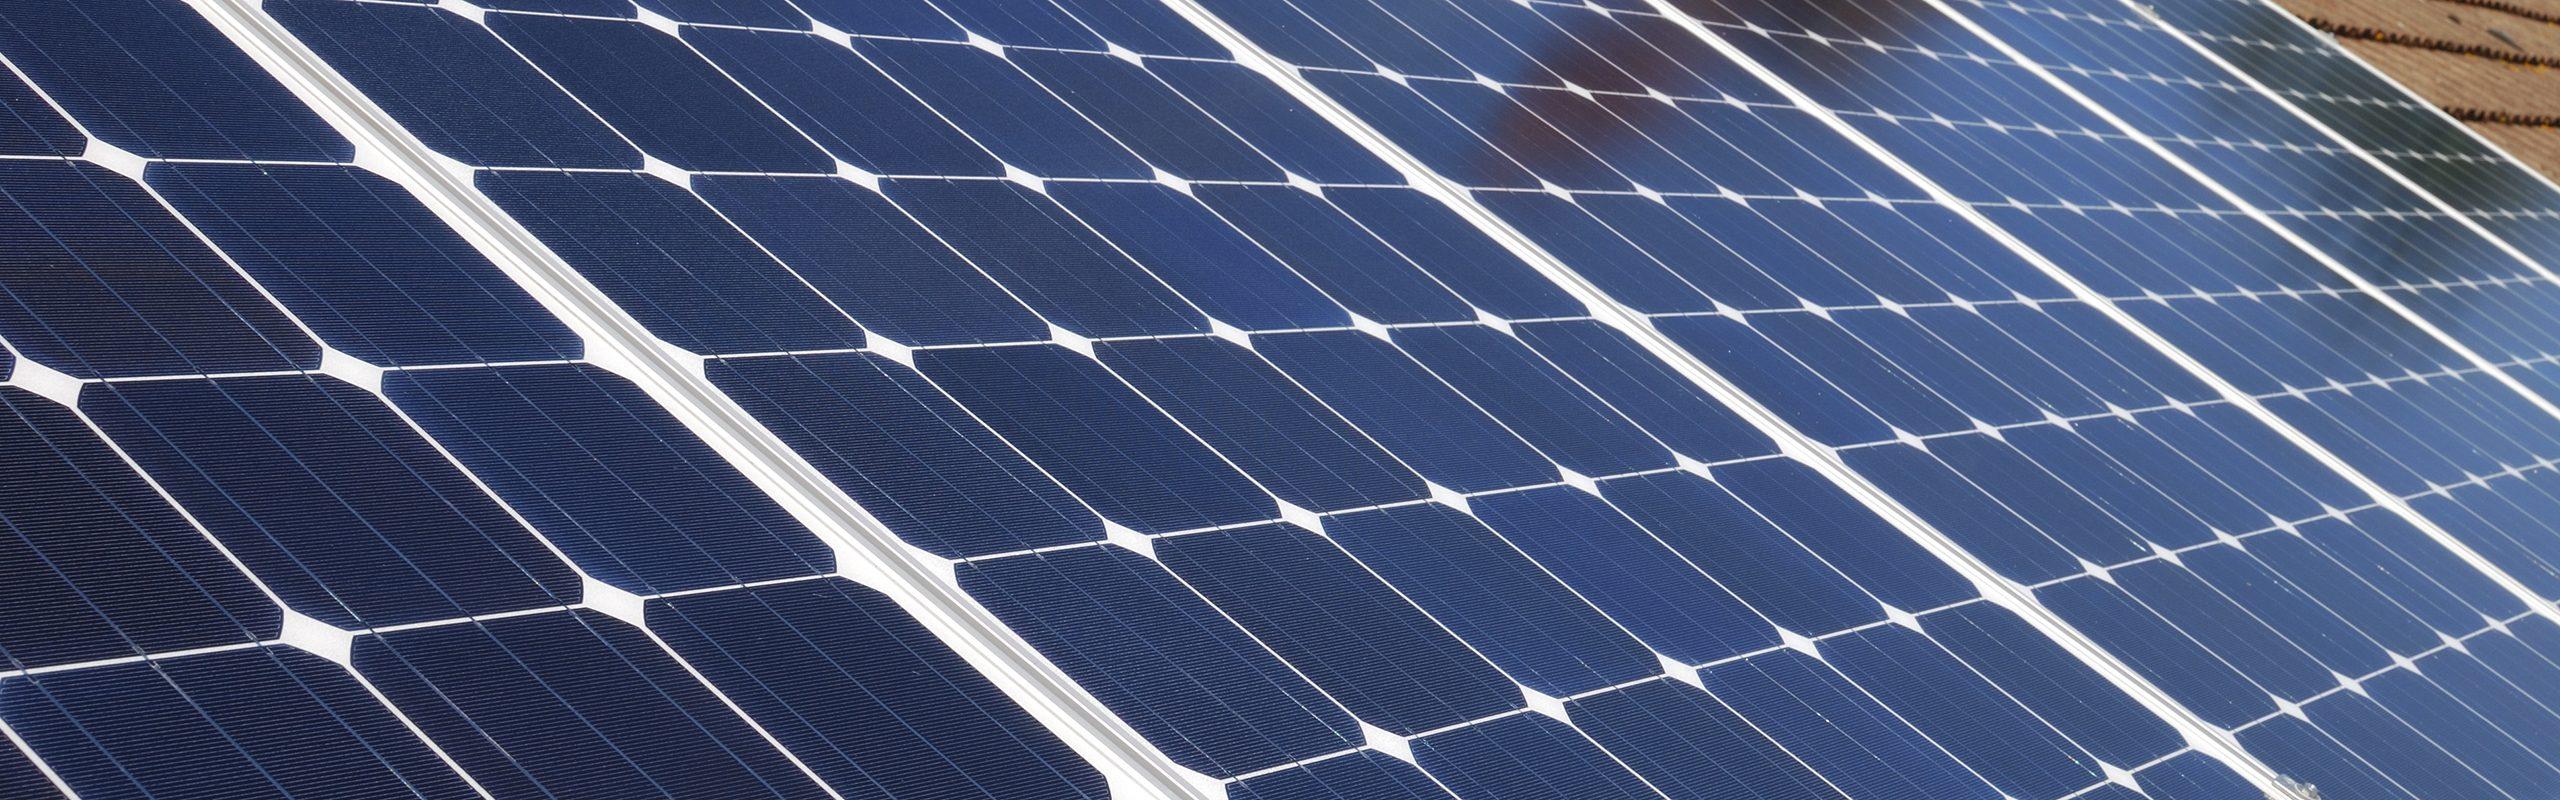 PV solar panel installation